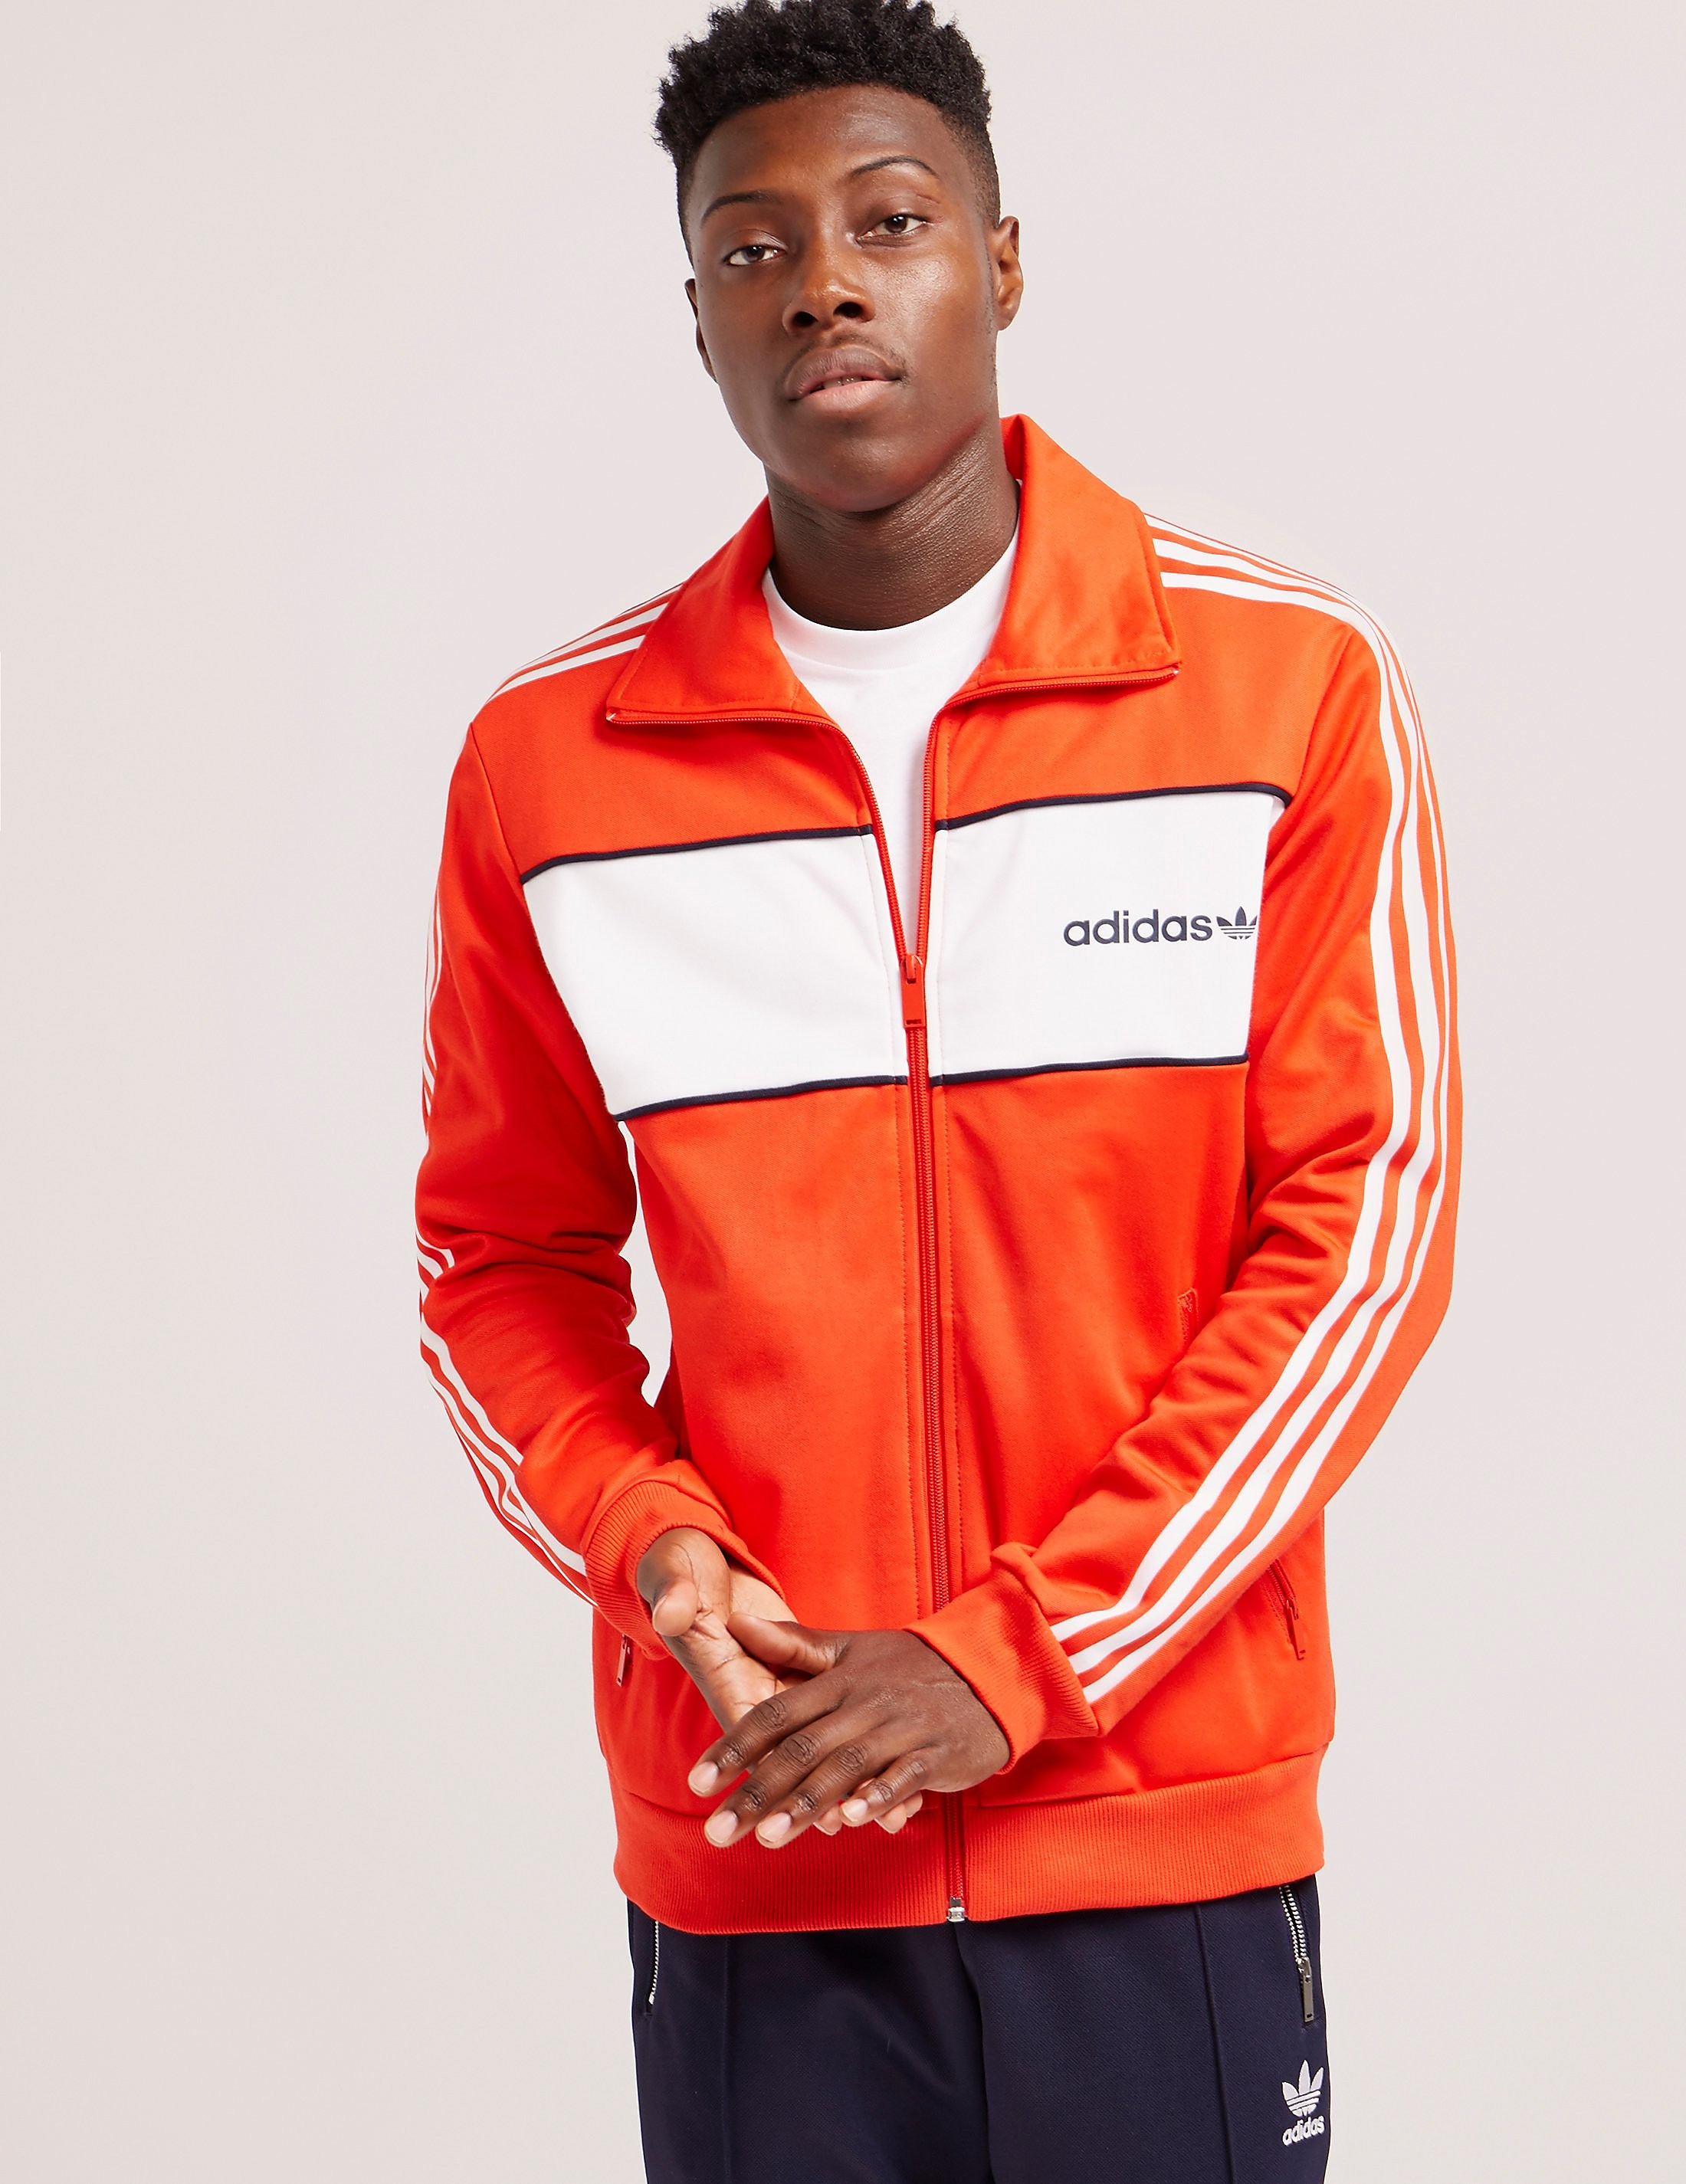 adidas Originals London Block Track Top